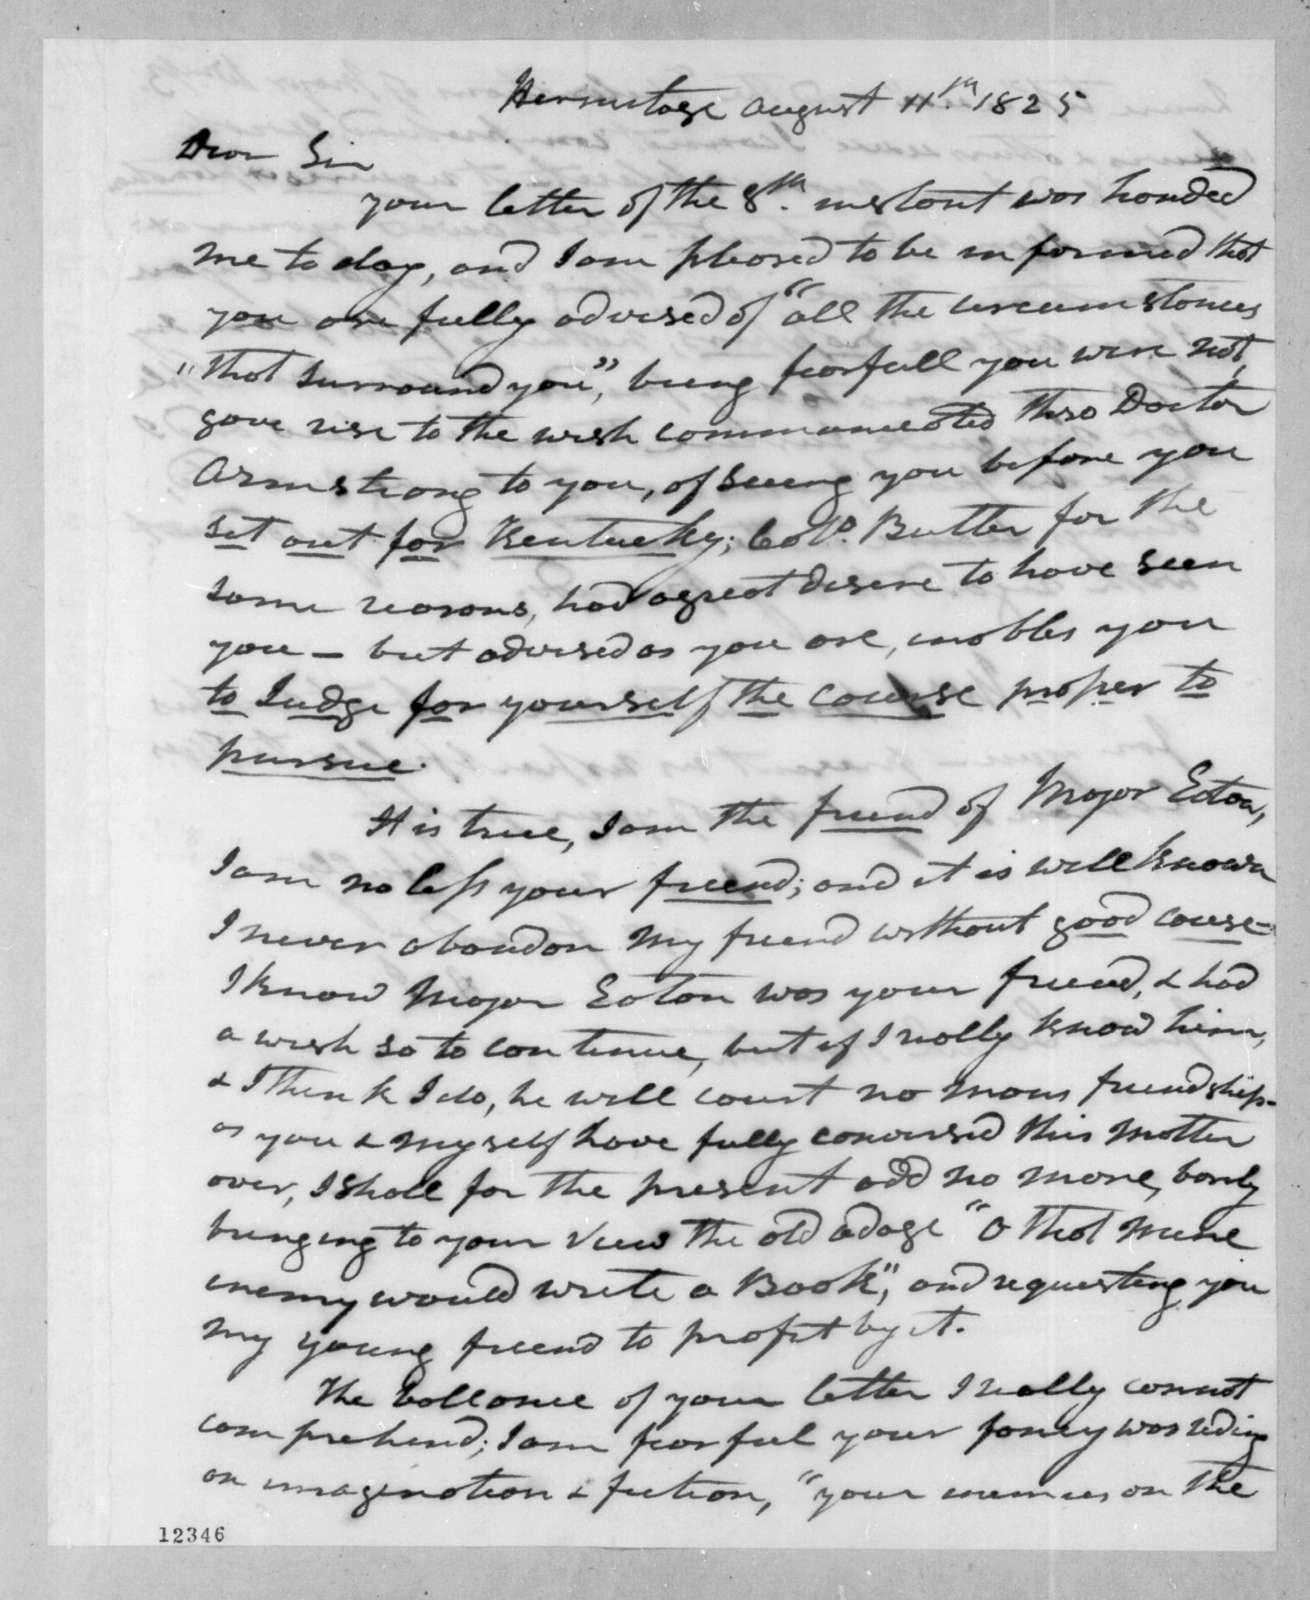 Andrew Jackson to Samuel Houston, August 11, 1825